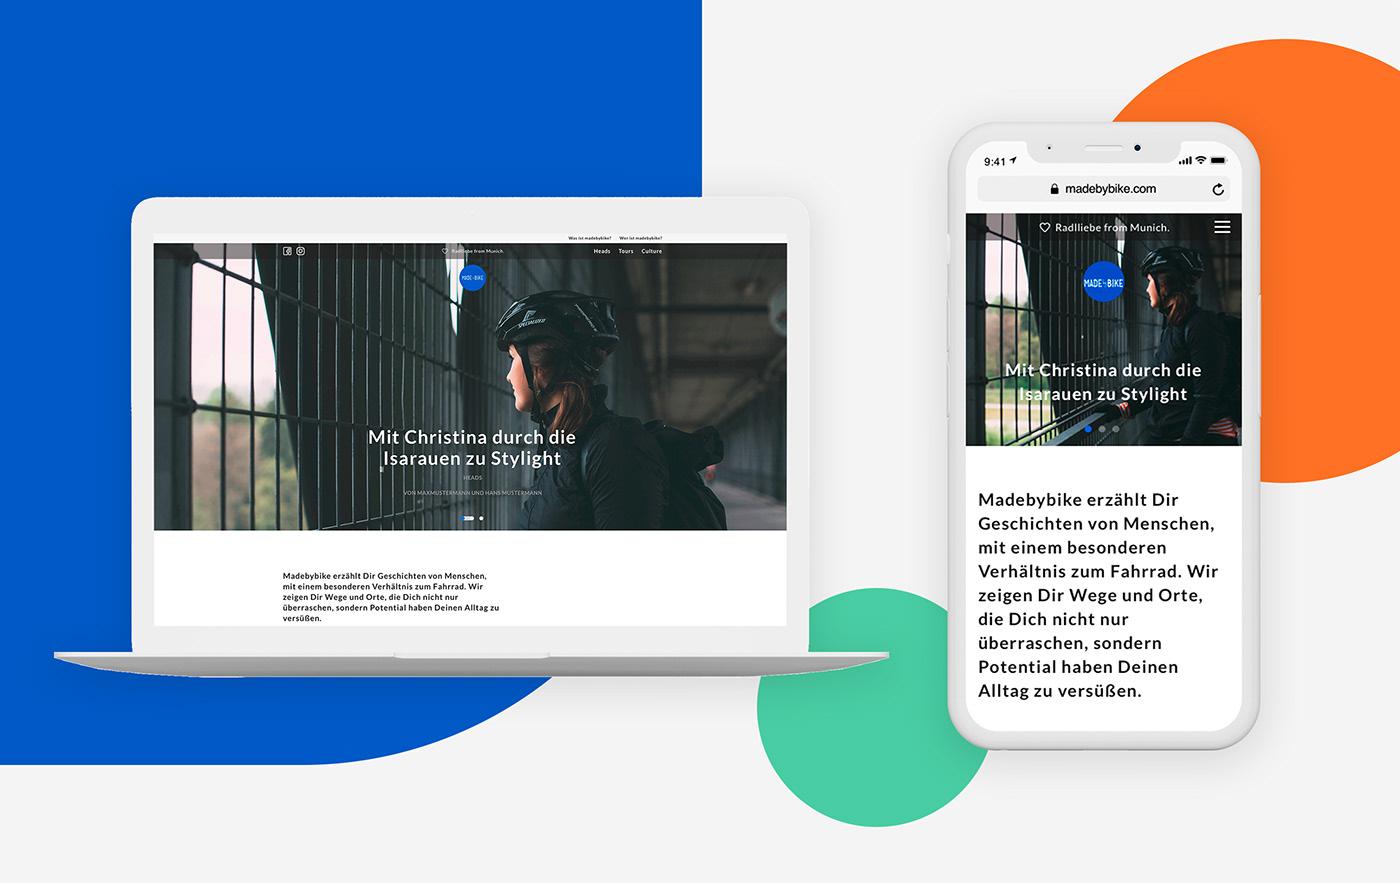 strategy ux/ui Responsive design content Blog community Cycling branding  mvp